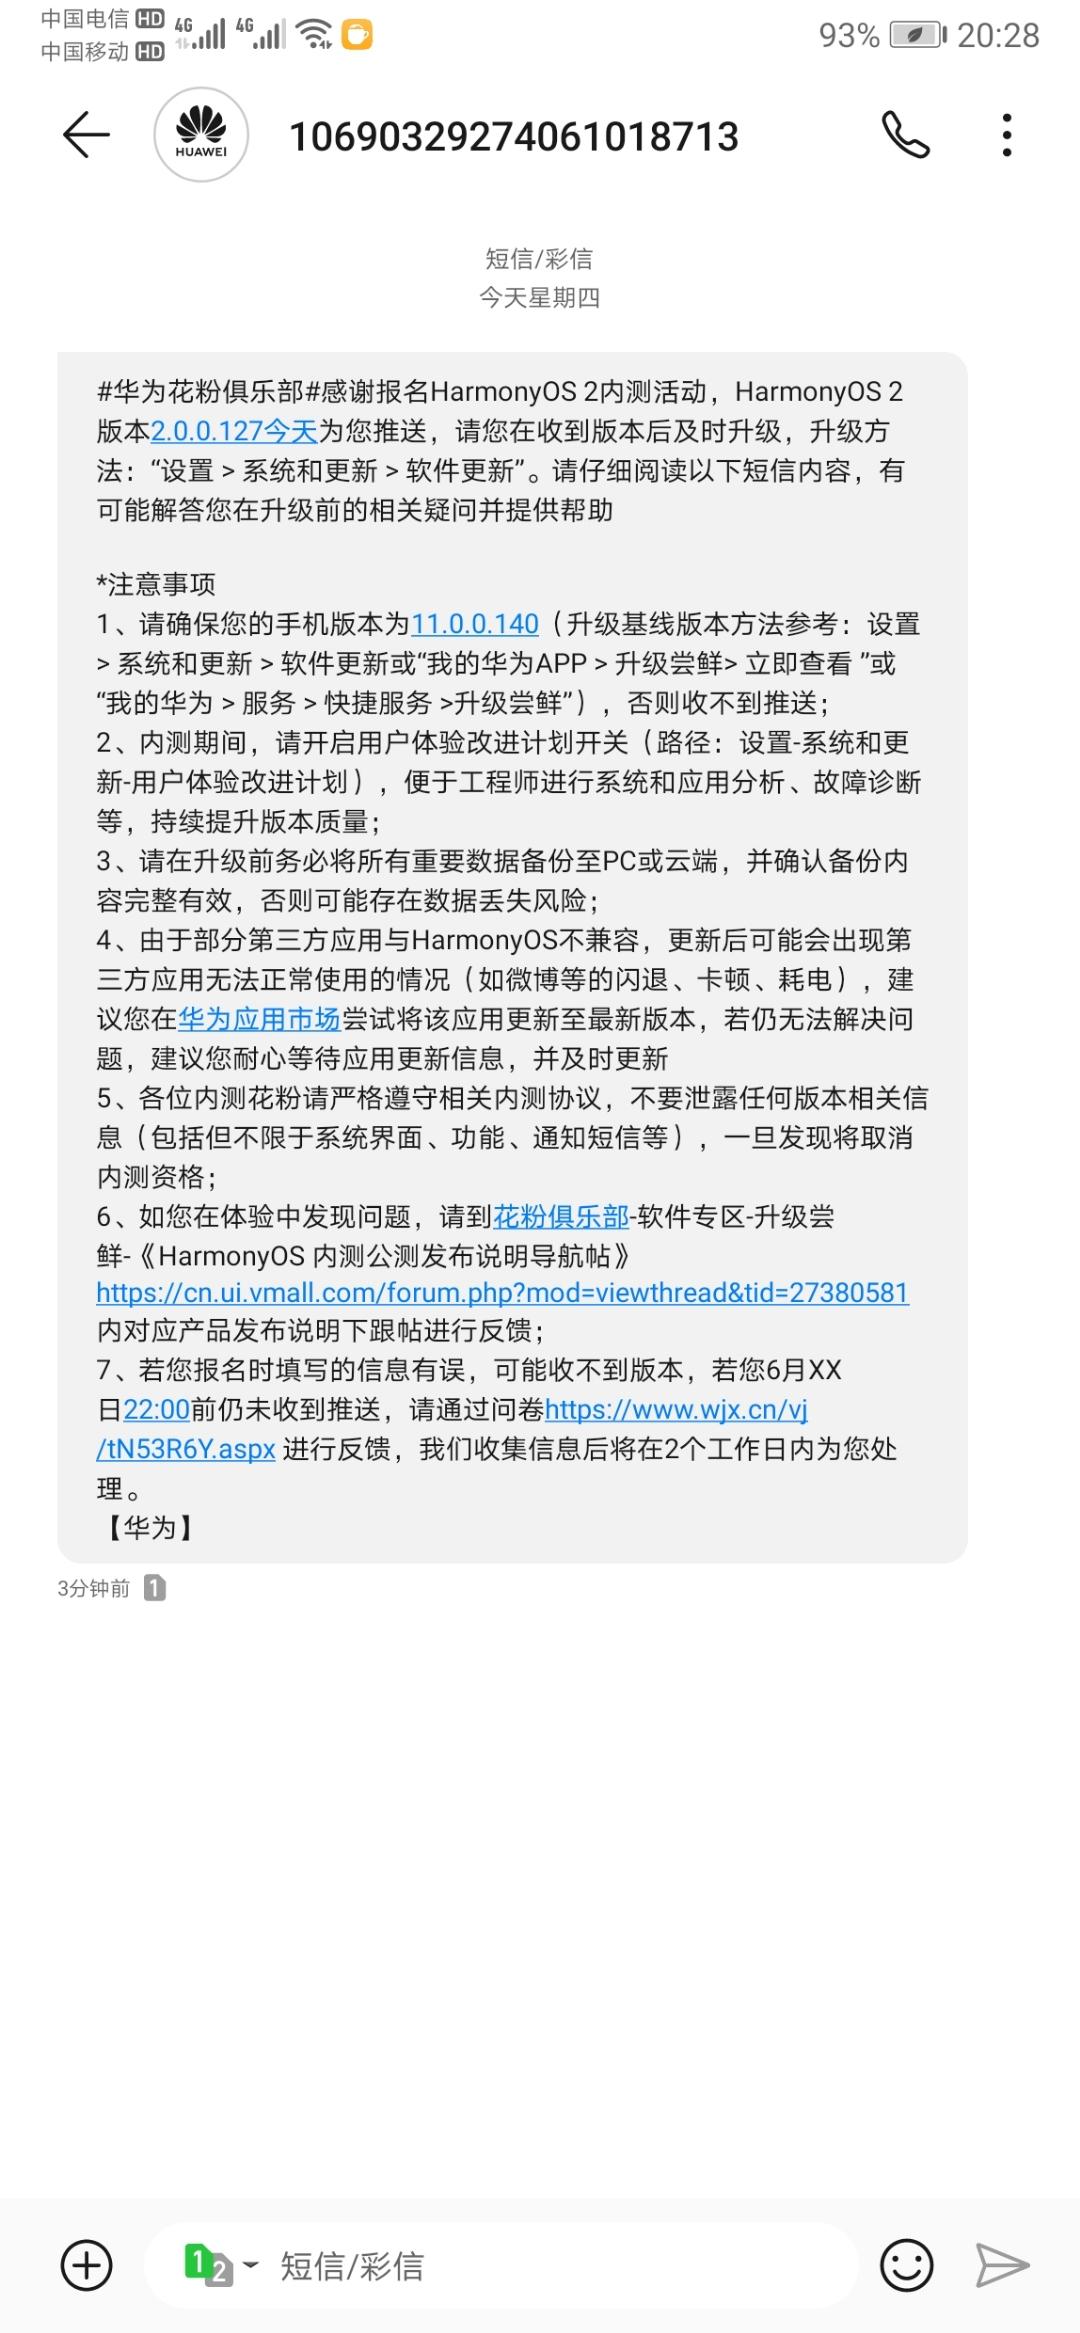 Screenshot_20210617_202804_com.android.mms.jpg